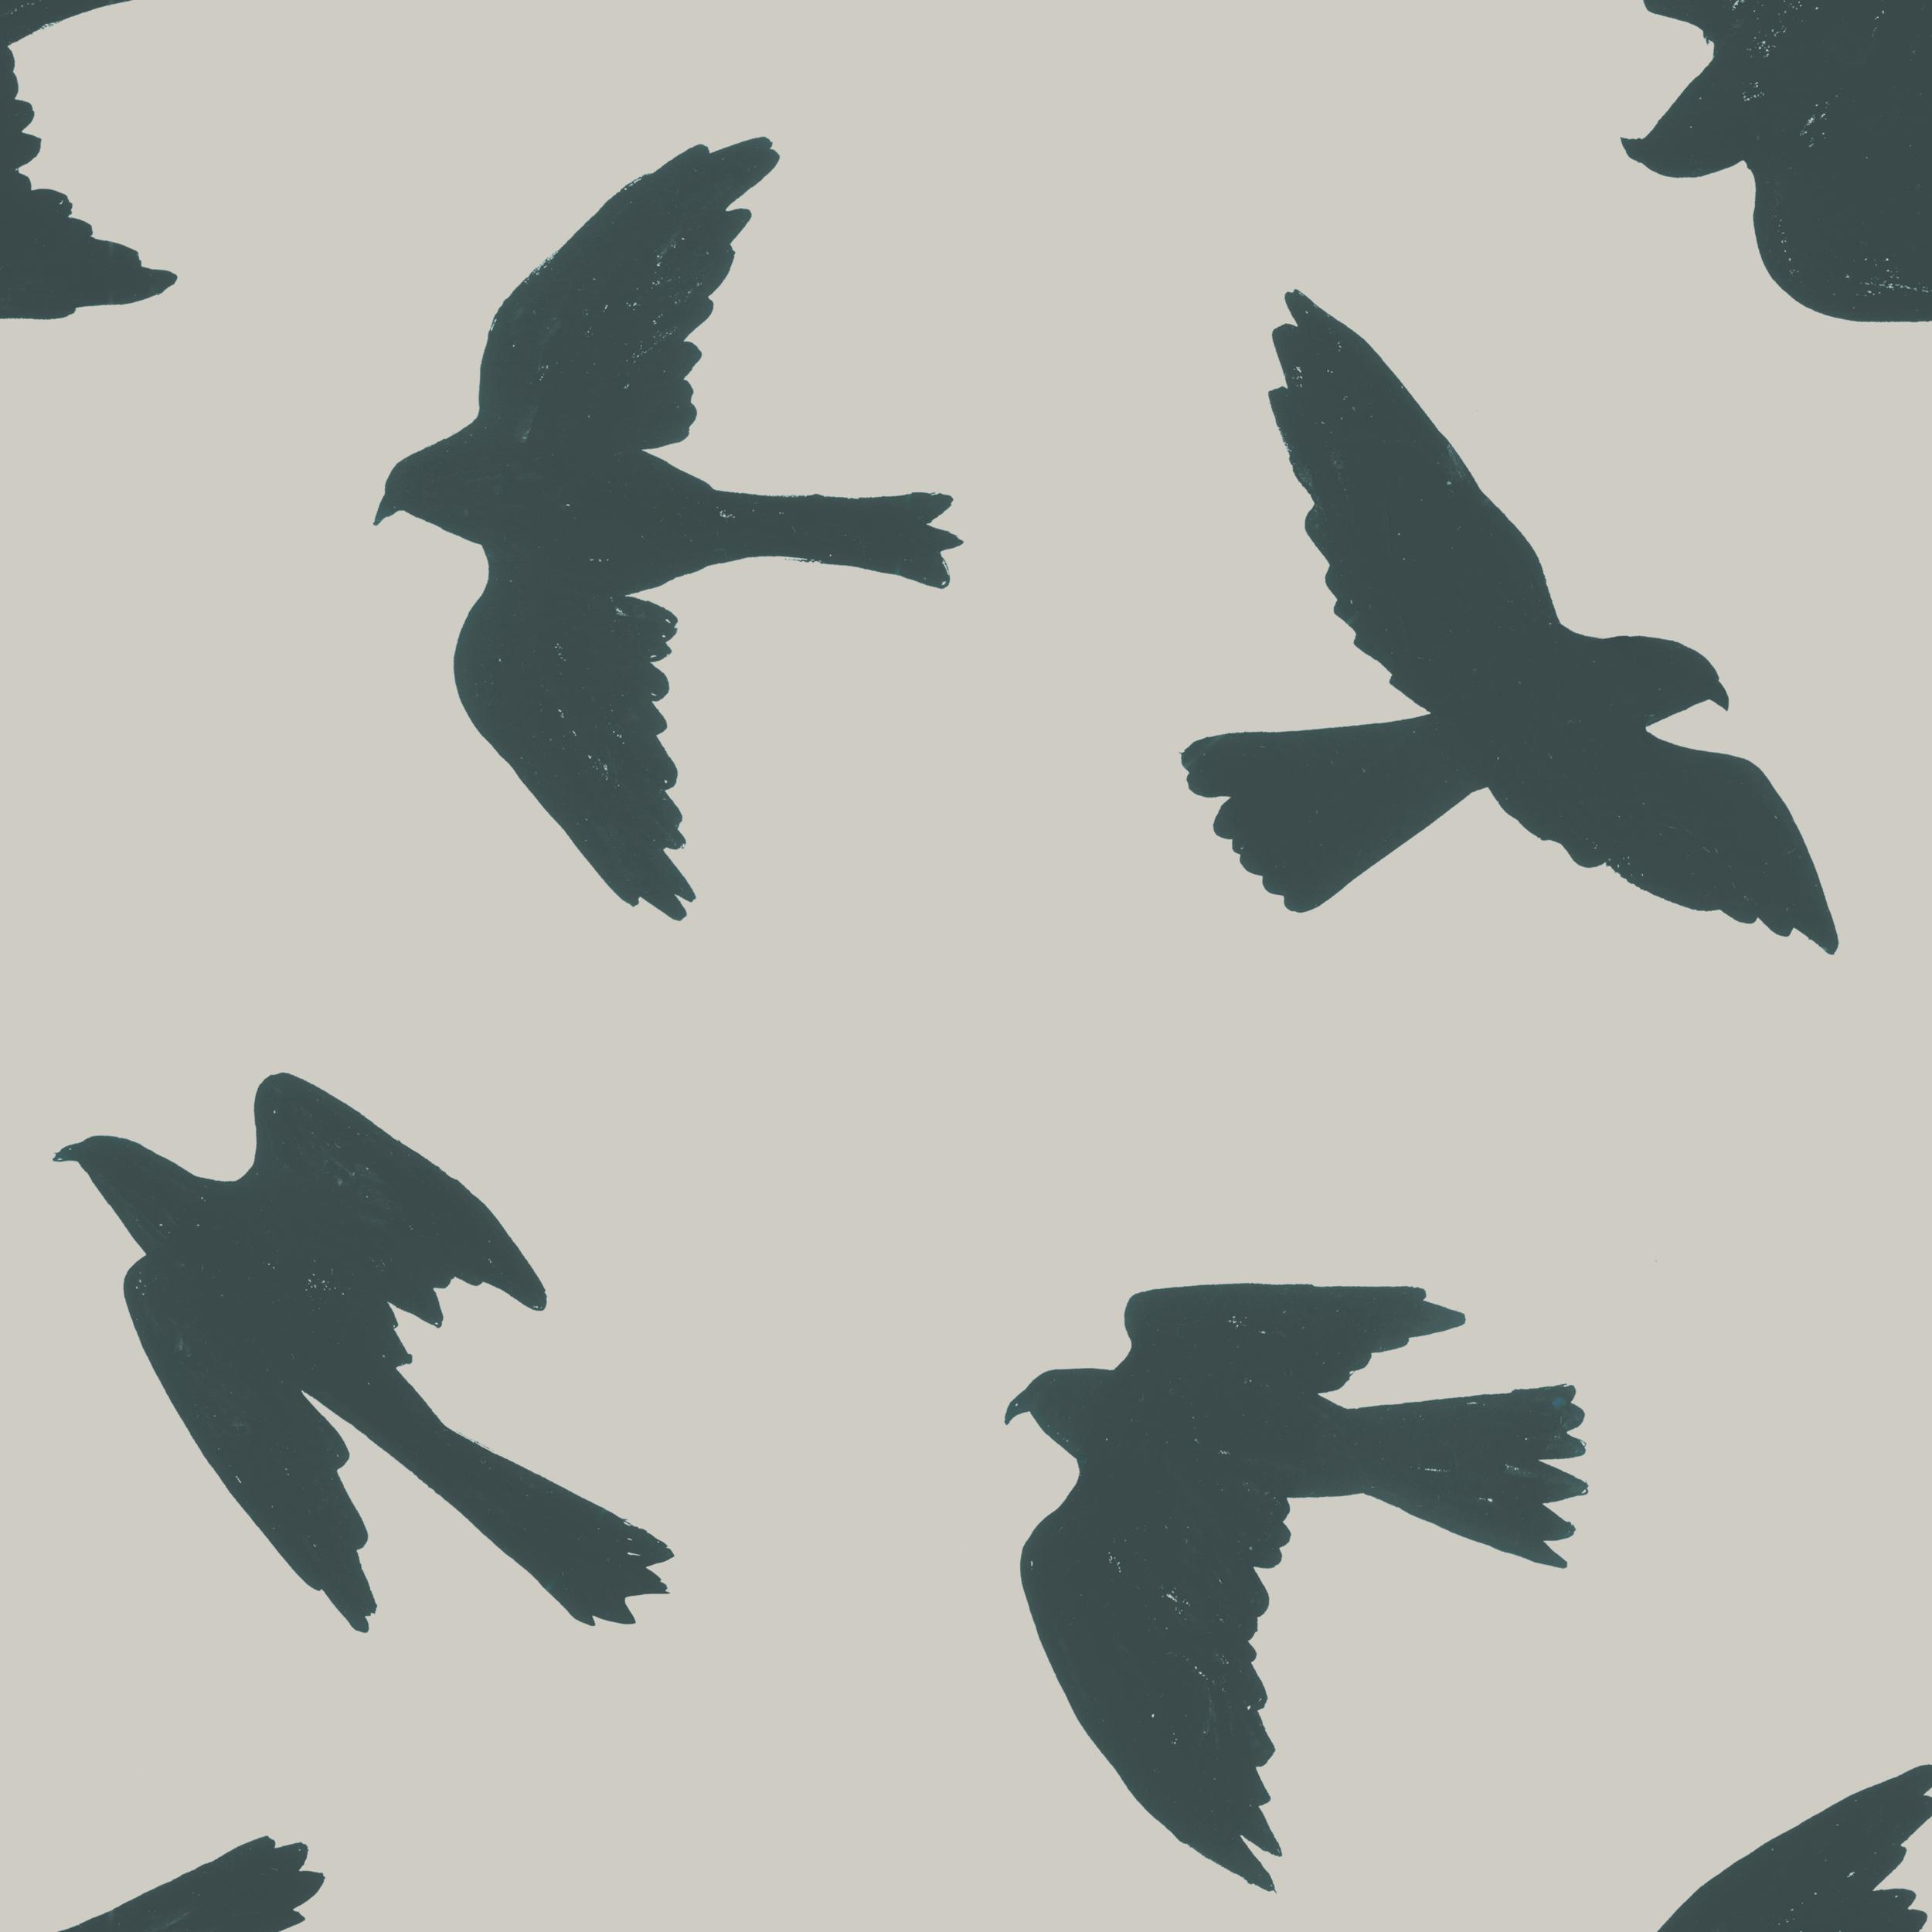 melissa boardman falcon silhouettes grey.png